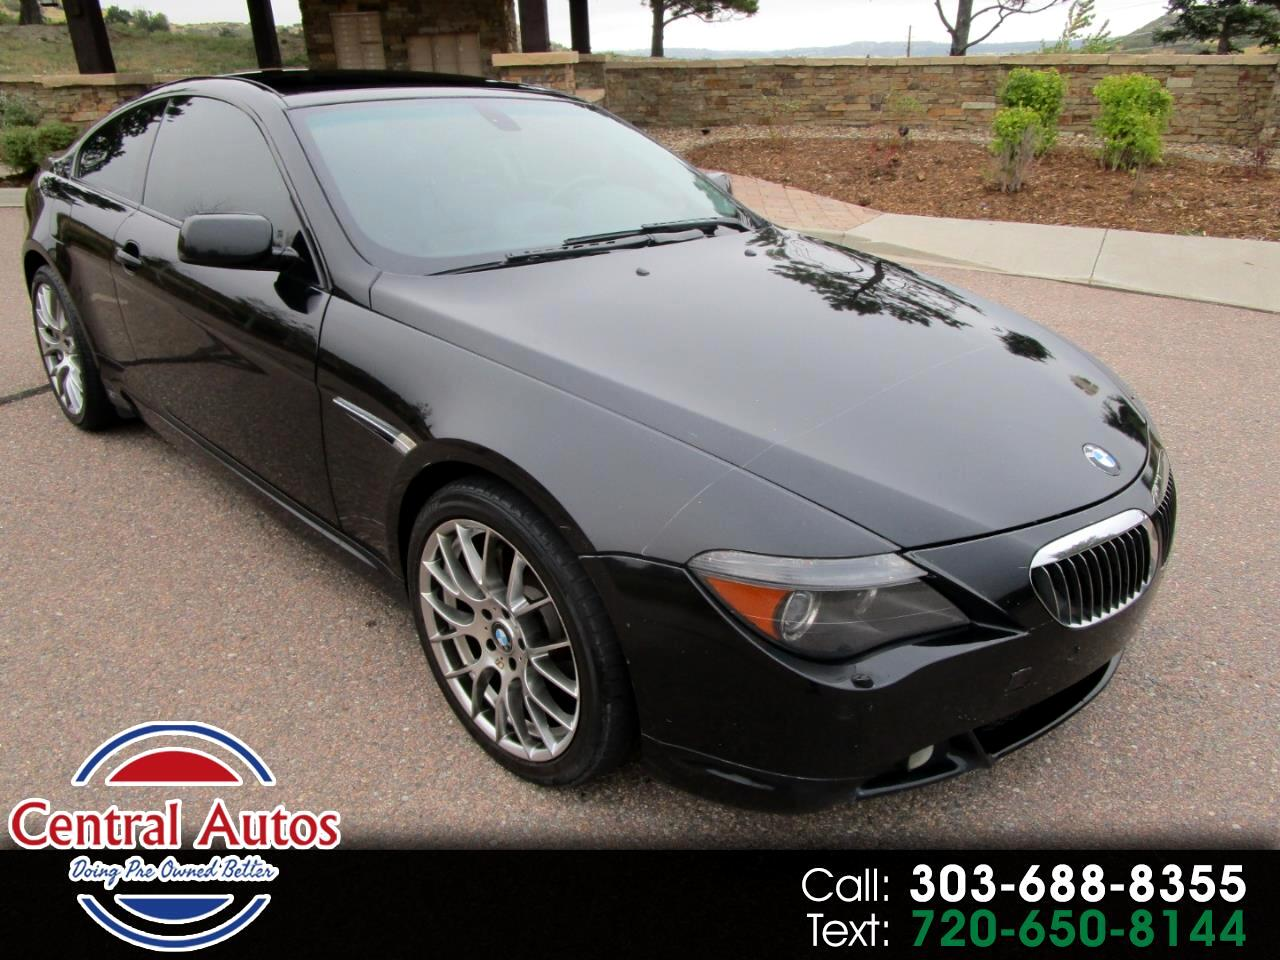 2007 BMW 6 Series 2dr Cpe 650i